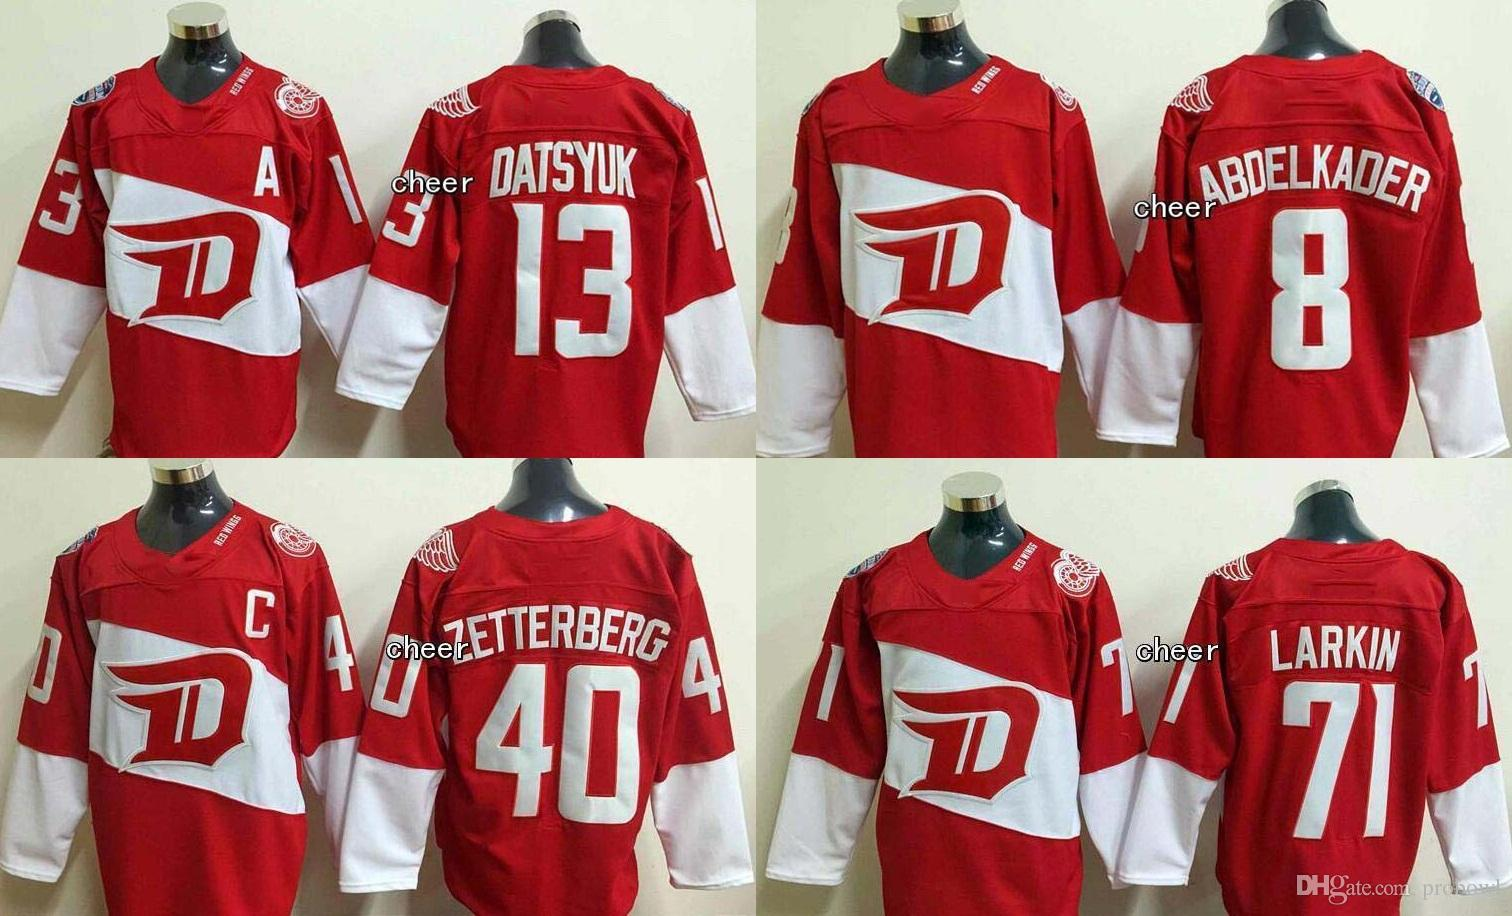 buy popular 783a6 05c1d New 2016 Stadium Series Jerseys Detroit Red Wings #71 Larkin #40 zetterberg  #13 datsyuk #8 abdelkader red Ice Hockey jerseys Drop Shipping